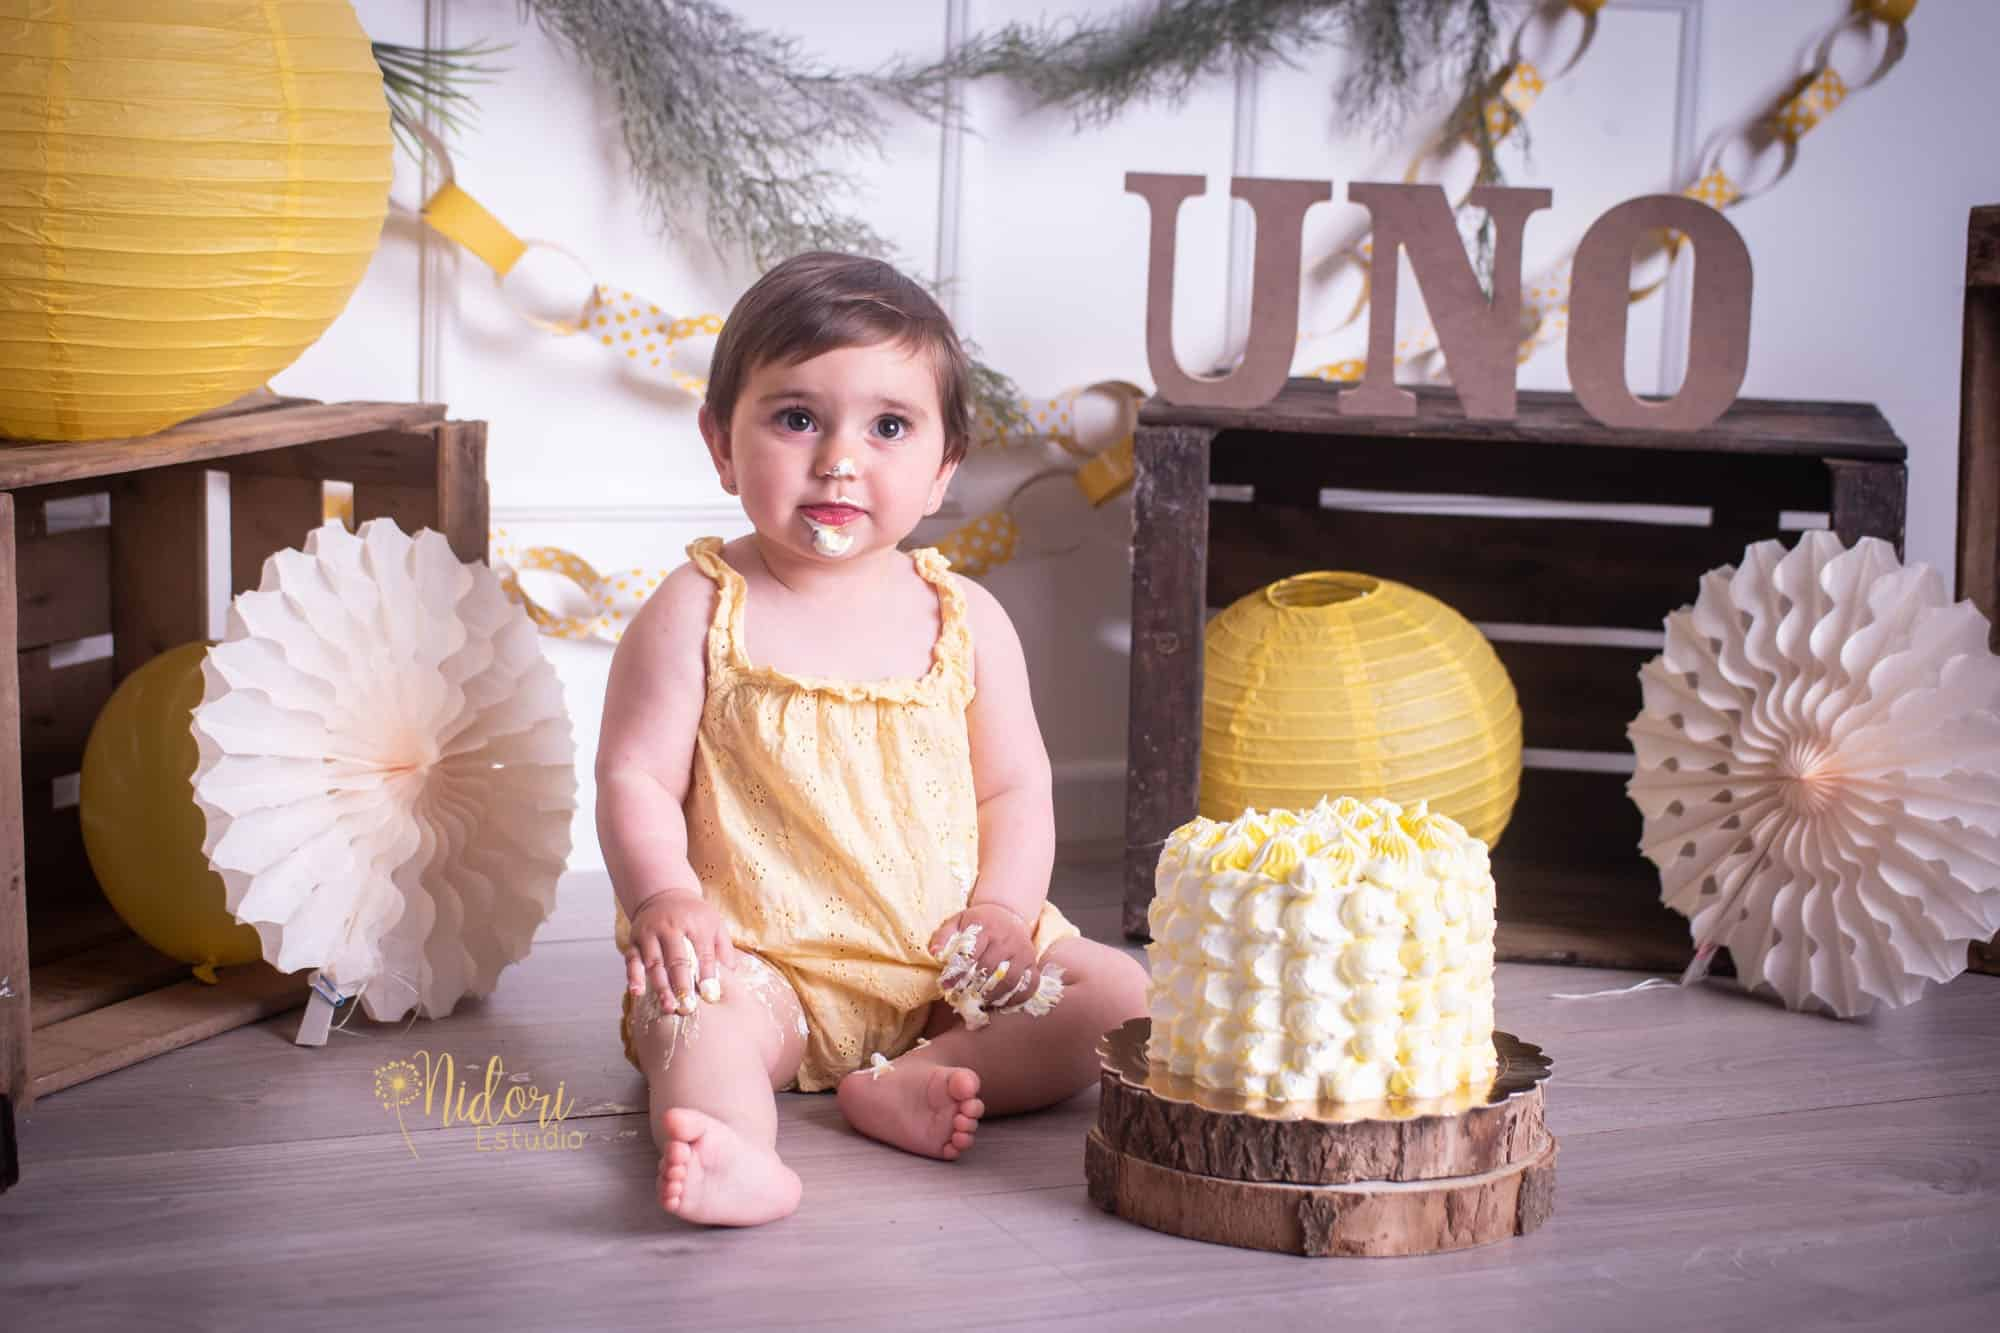 smash-cake-cumpleaños-tarta-fotografia-niños-bebes-nidoriestudio-fotos-valencia-almazora-castellon-españa-spain-10